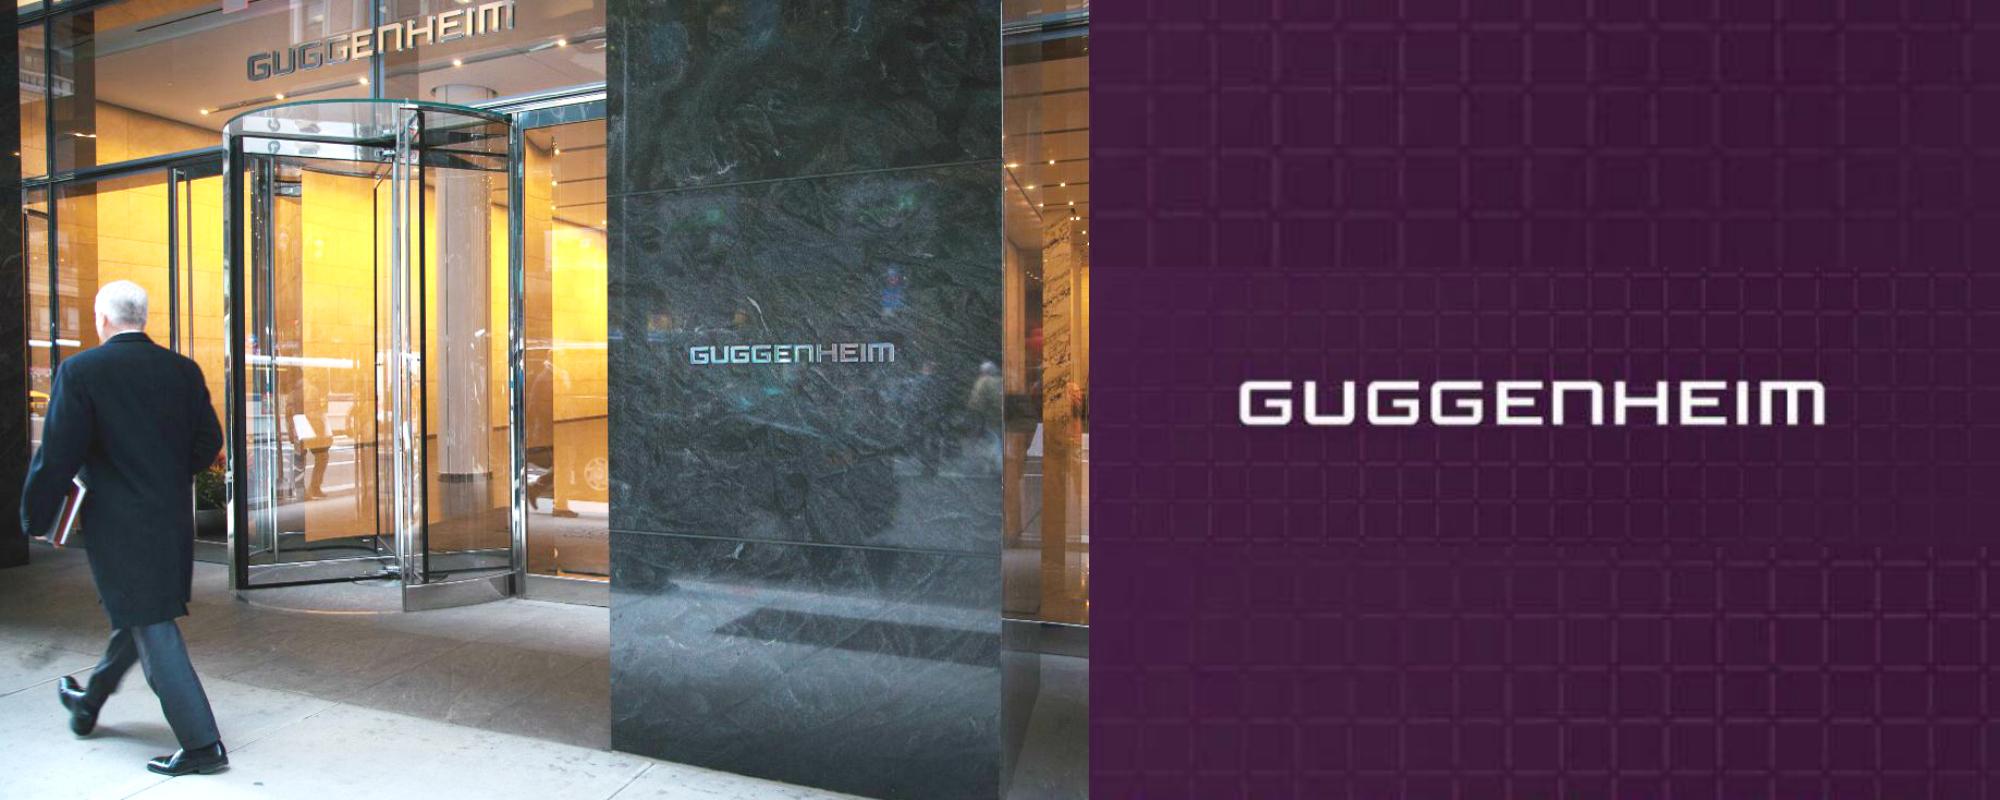 guggenheim banner Most Powerful M&A Firms in the world best upslide